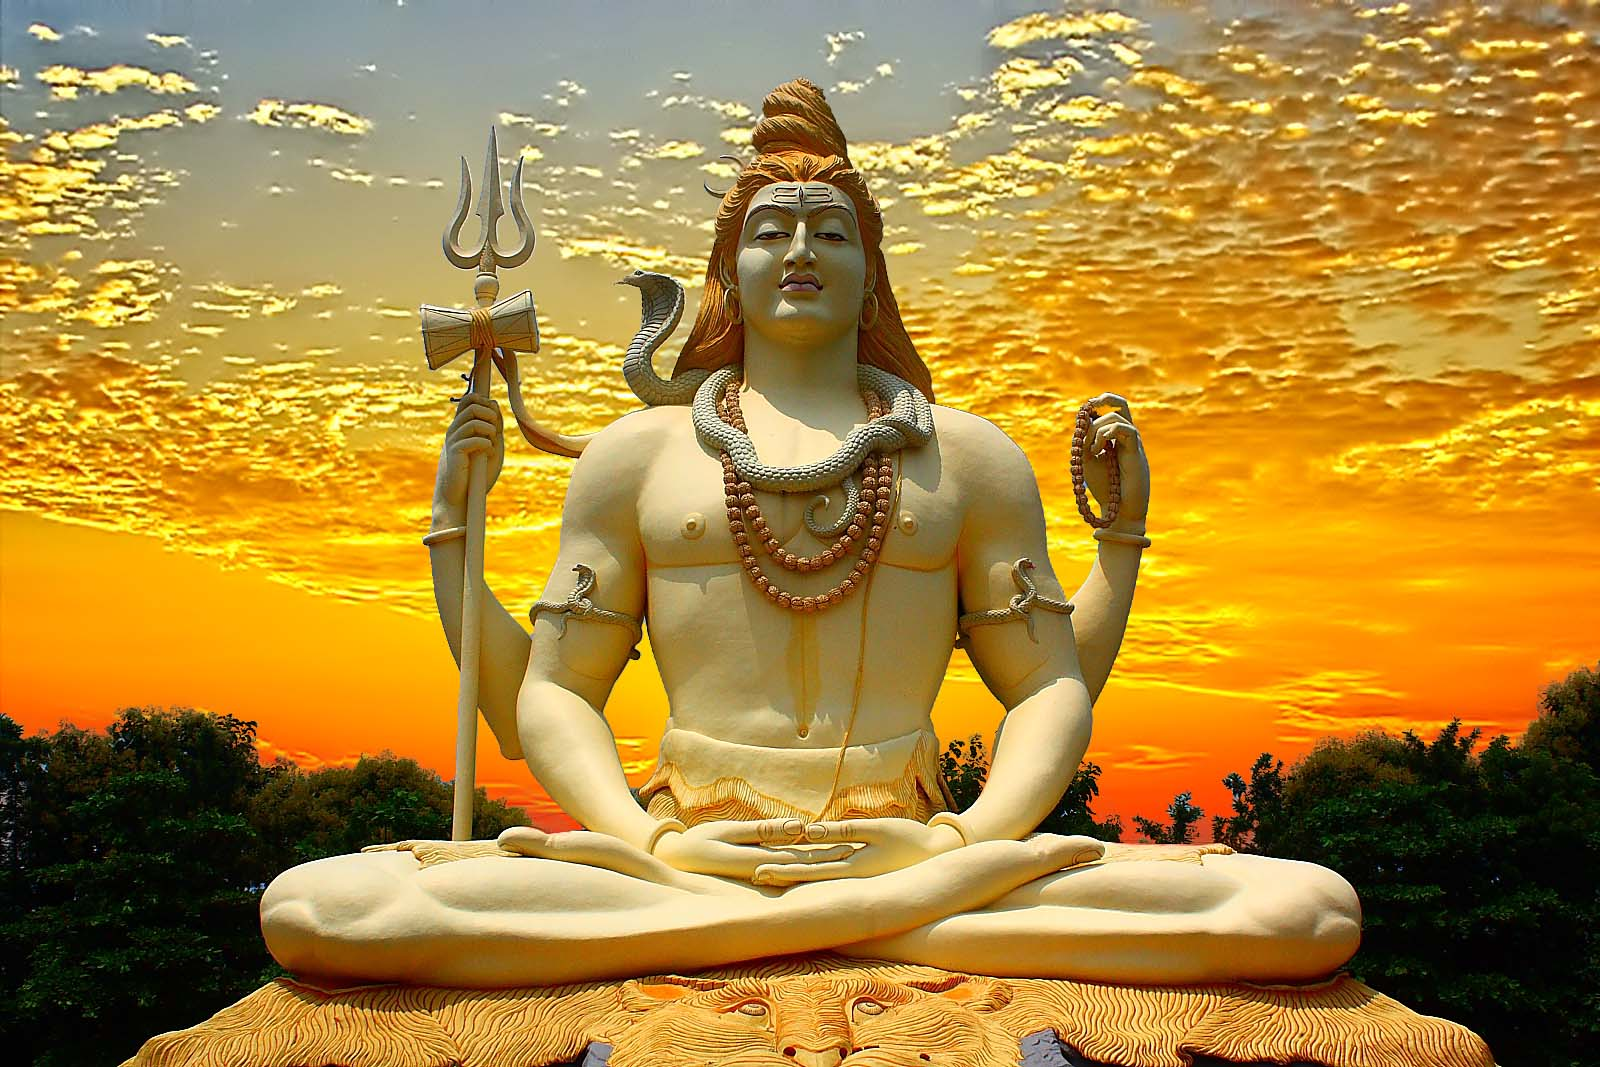 Wallpapers Hindu God Shiva Wallpaper Lord Shiva Sunsetsky HD 1600x1067